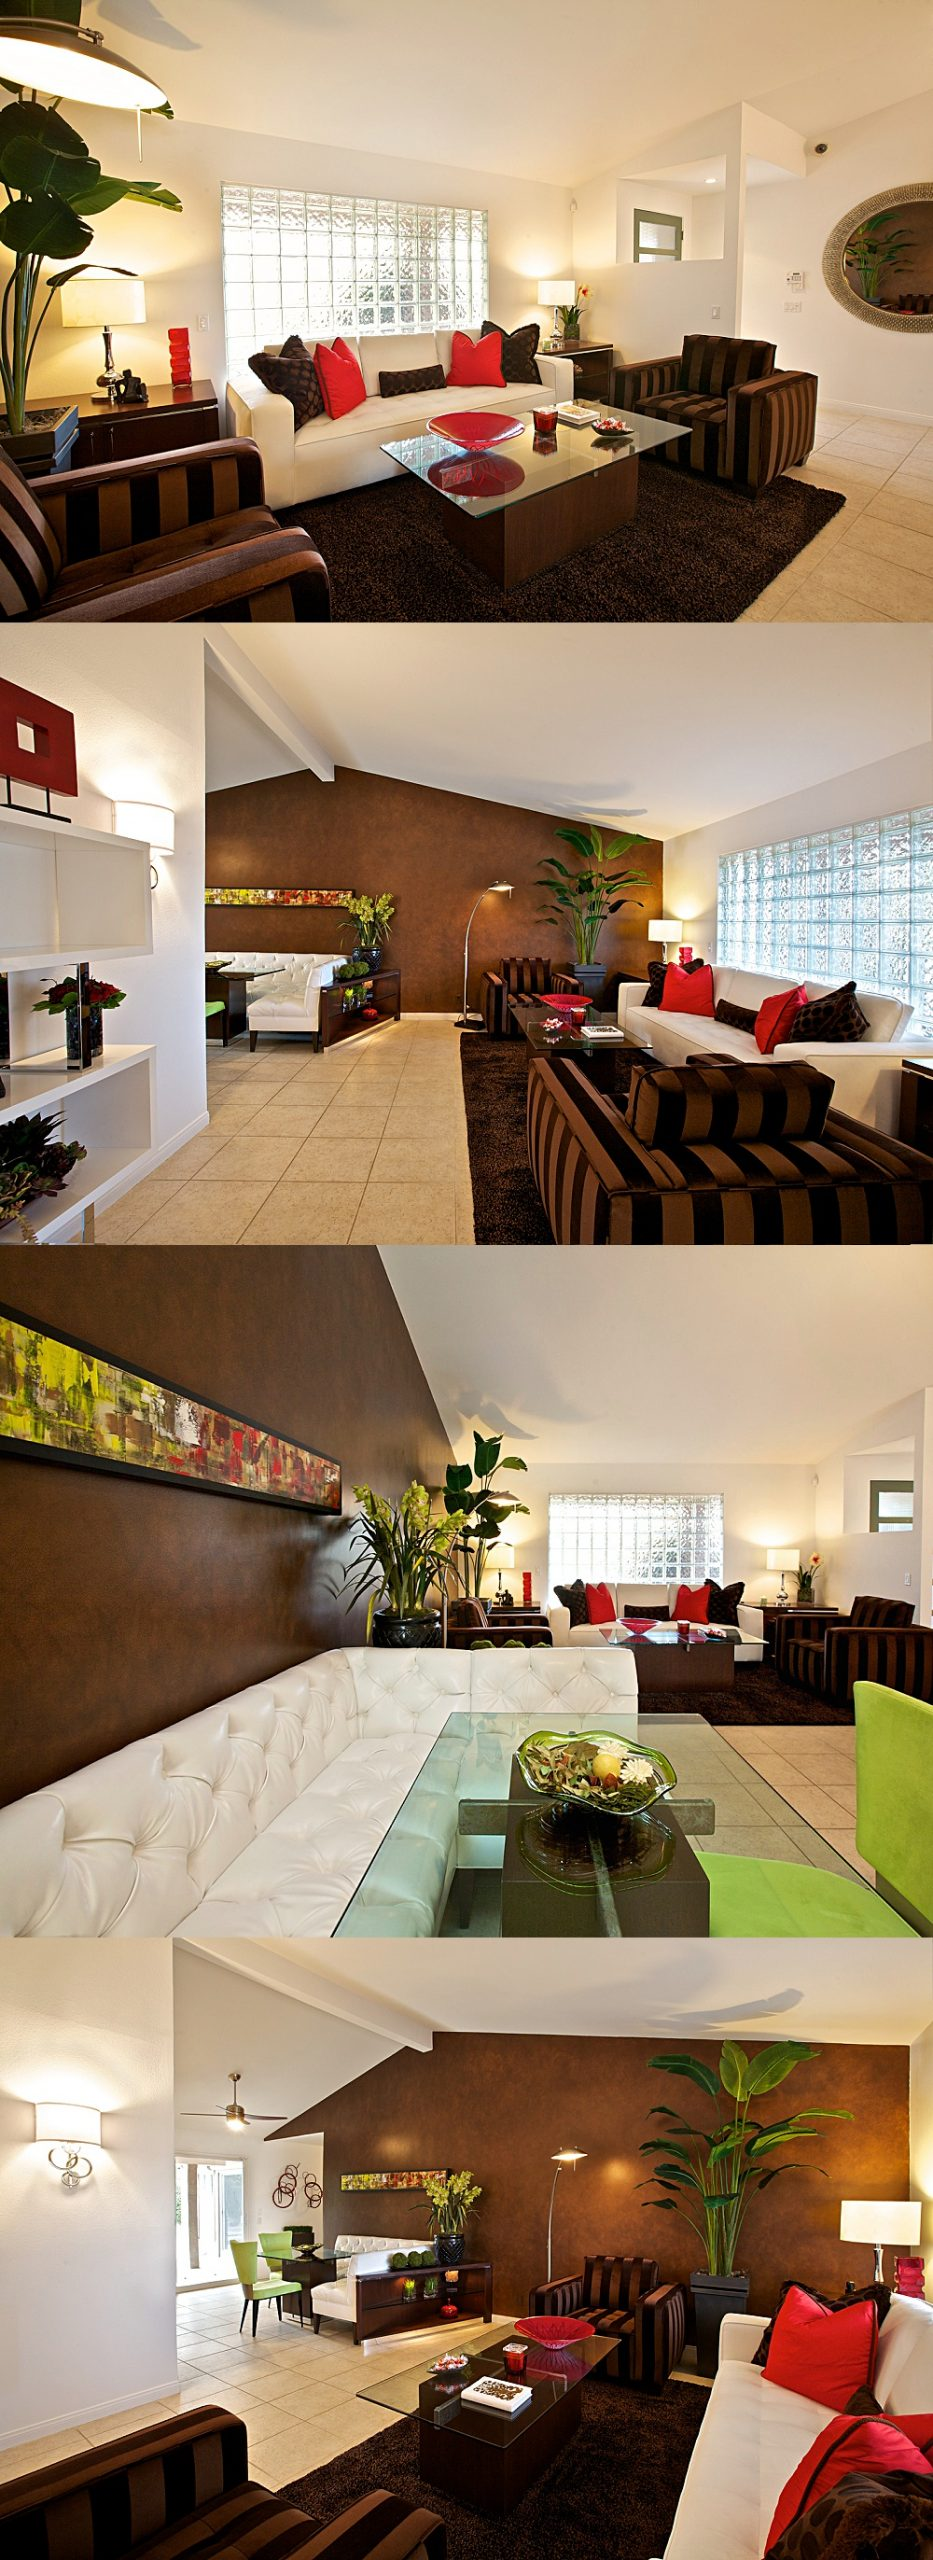 lori_tiedeman_interiors_palm_springs_interior_designer_red_pool_table